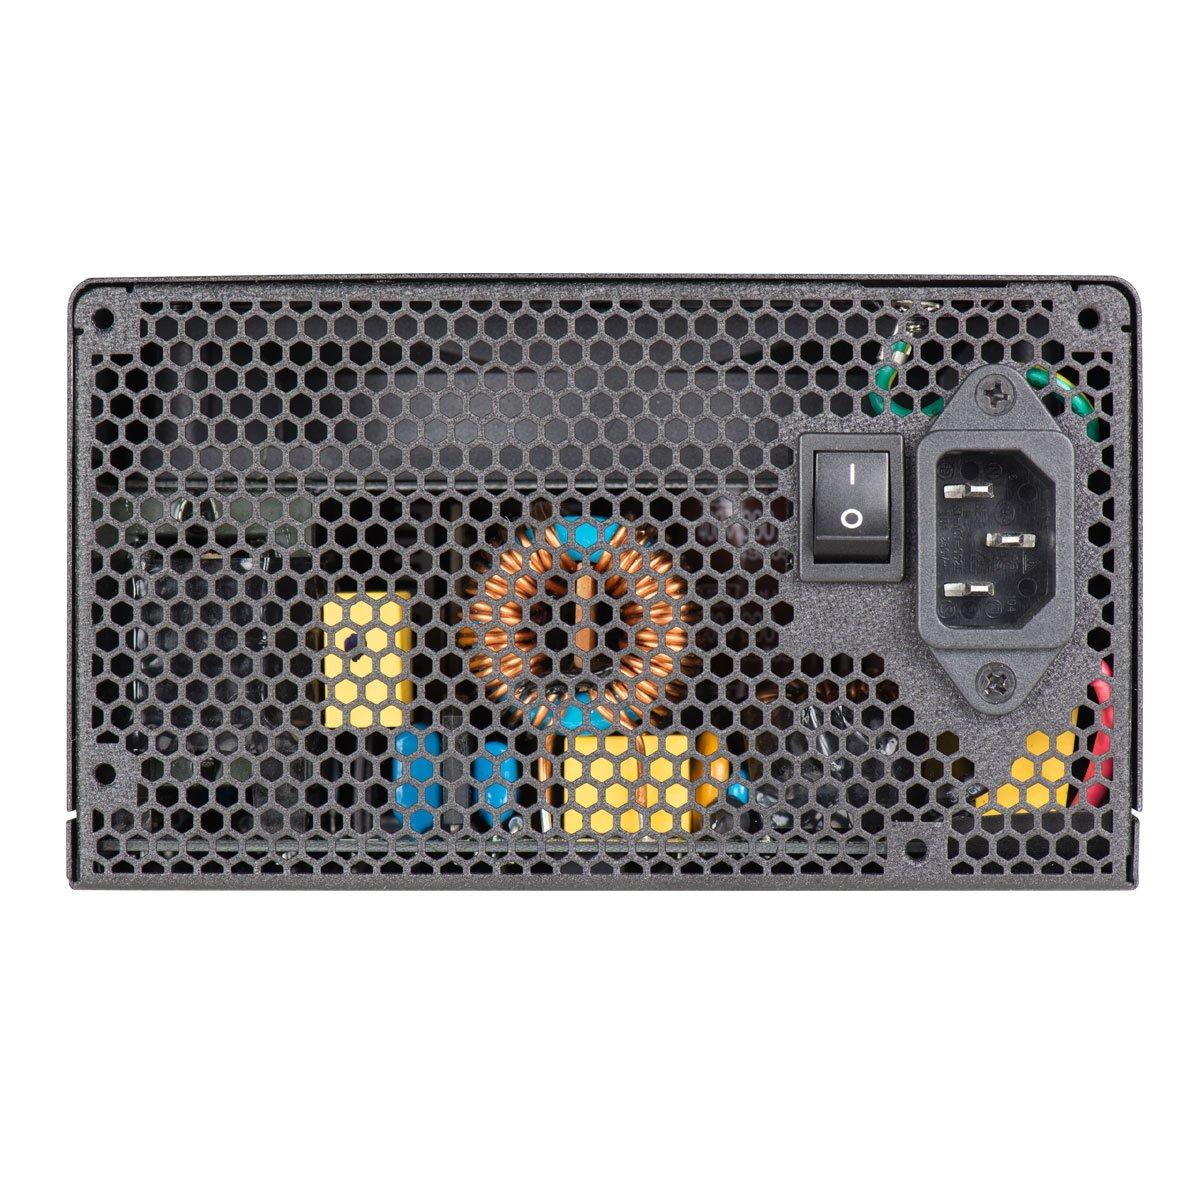 EVGA SuperNOVA 1000 T2, 80+ TITANIUM 1000W, Fully Modular, EVGA ECO Mode, 10 Year Warranty , Includes FREE Power On Self Tester, Power Supply 220-T2-1000-X1 by EVGA (Image #7)